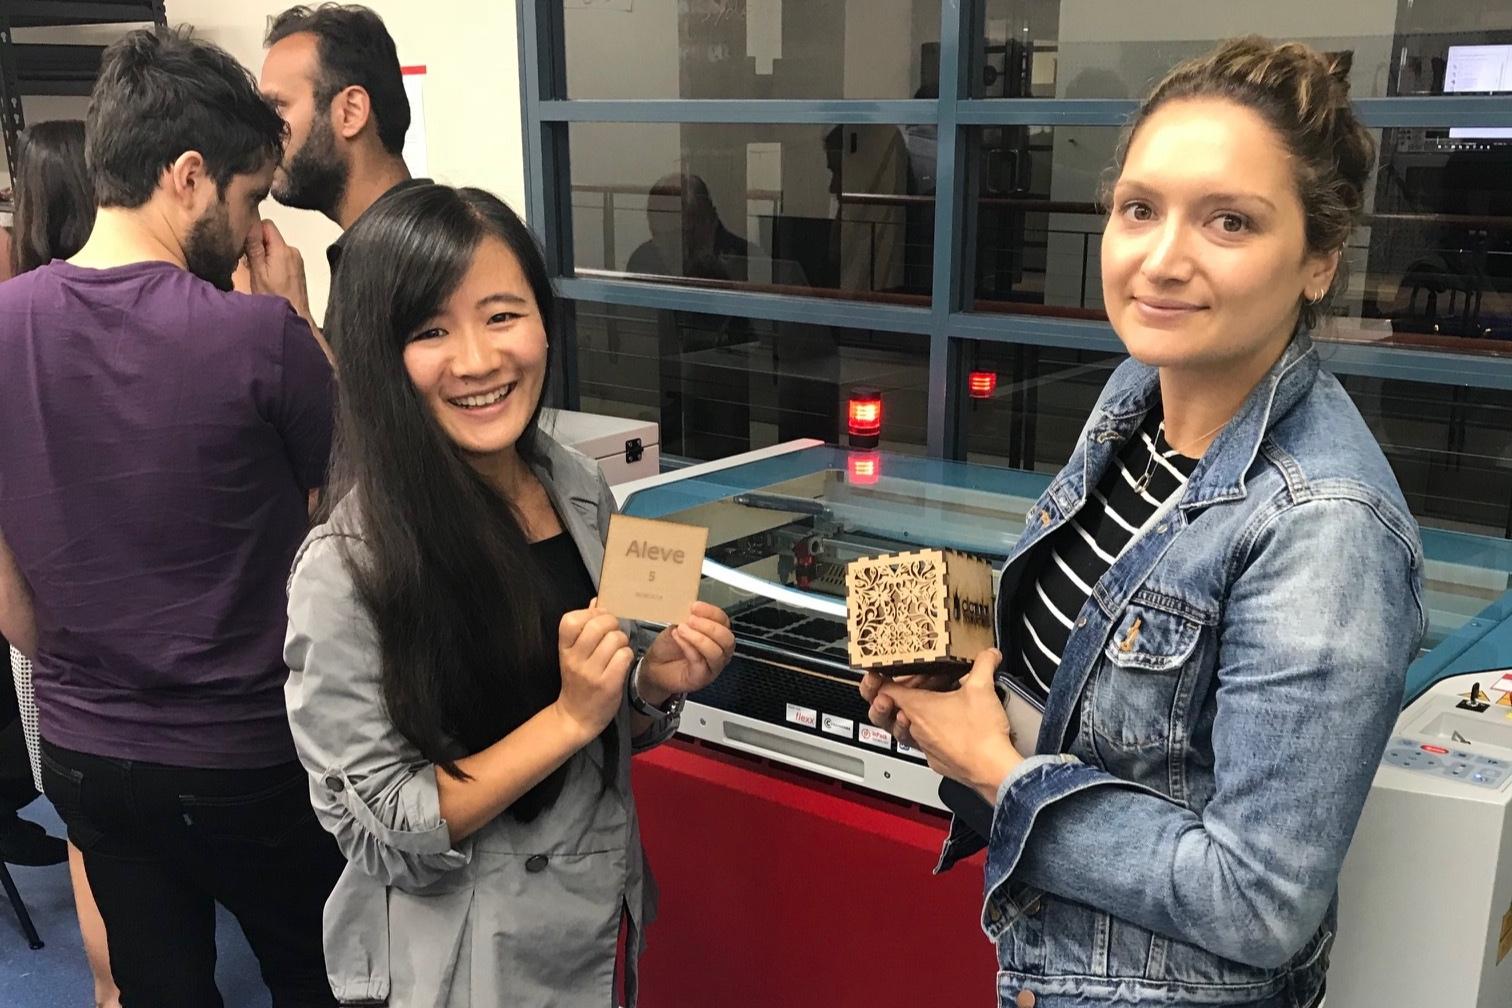 Girls showing laser cutting materials